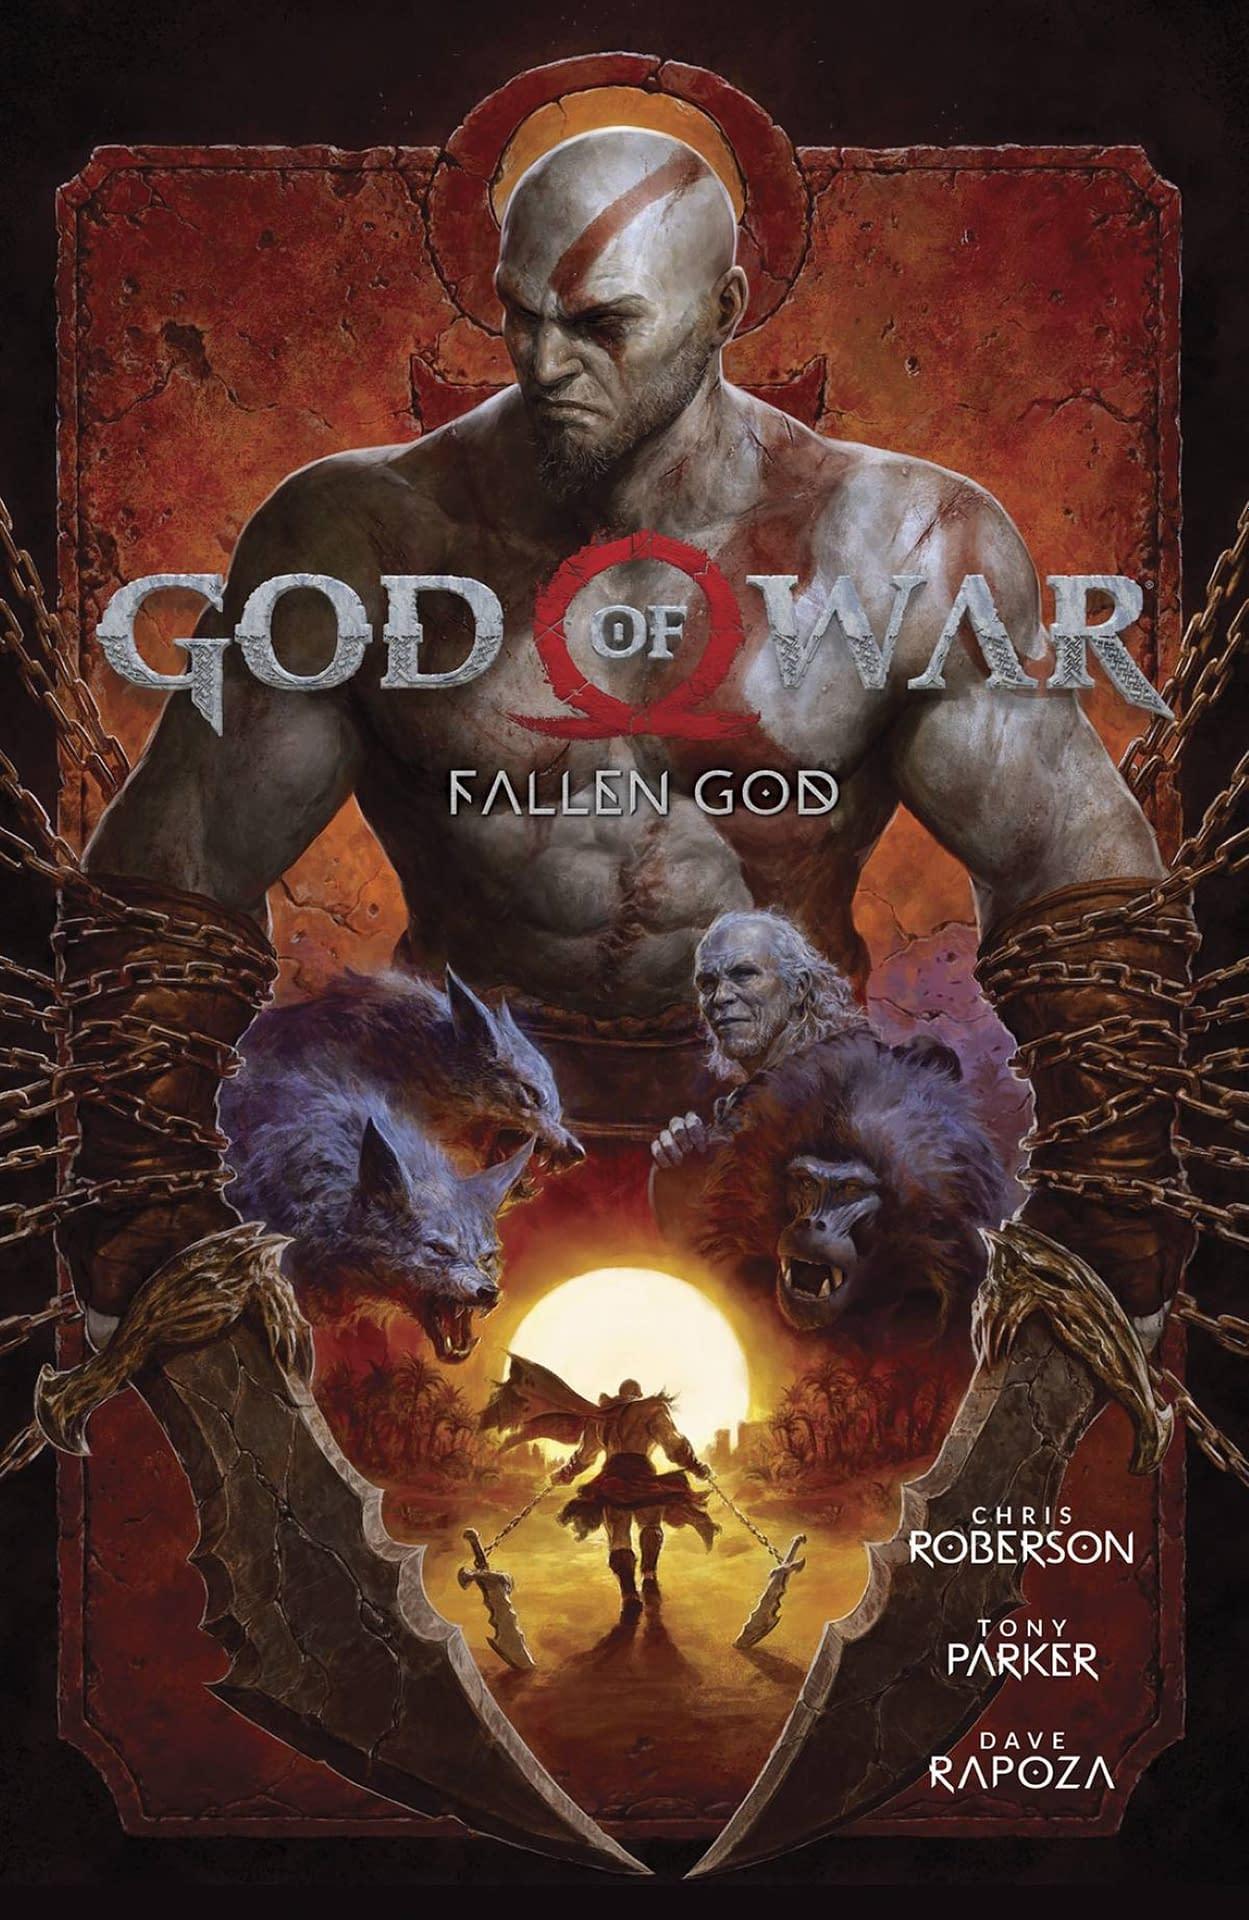 GOD OF WAR FALLEN GOD TP (MR)